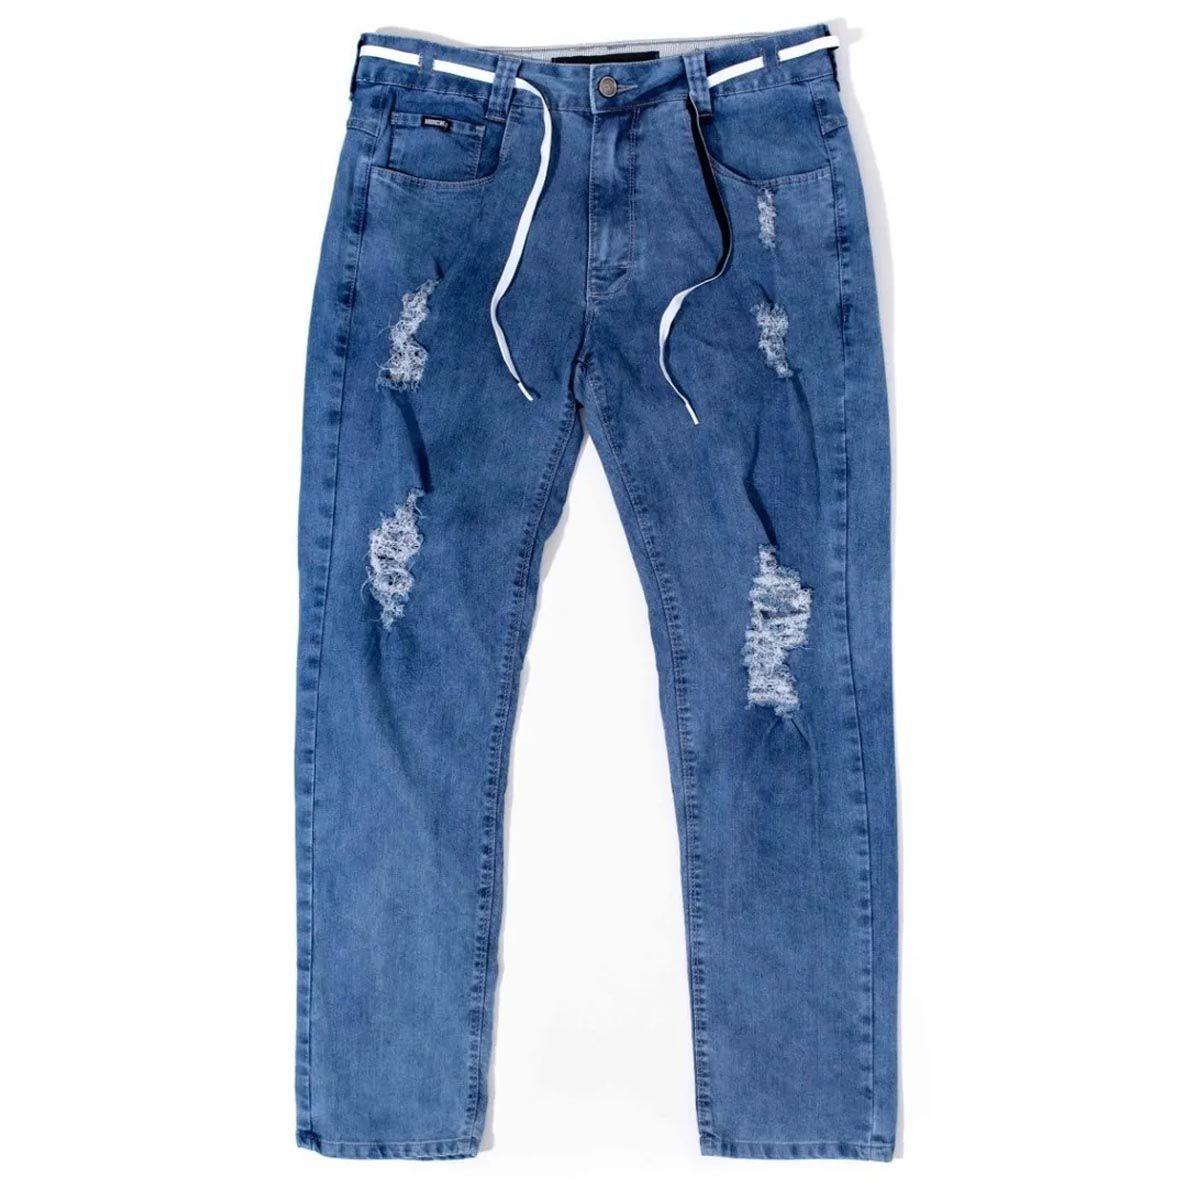 Calça Hocks 20-816 Jeans Masculina Smoking